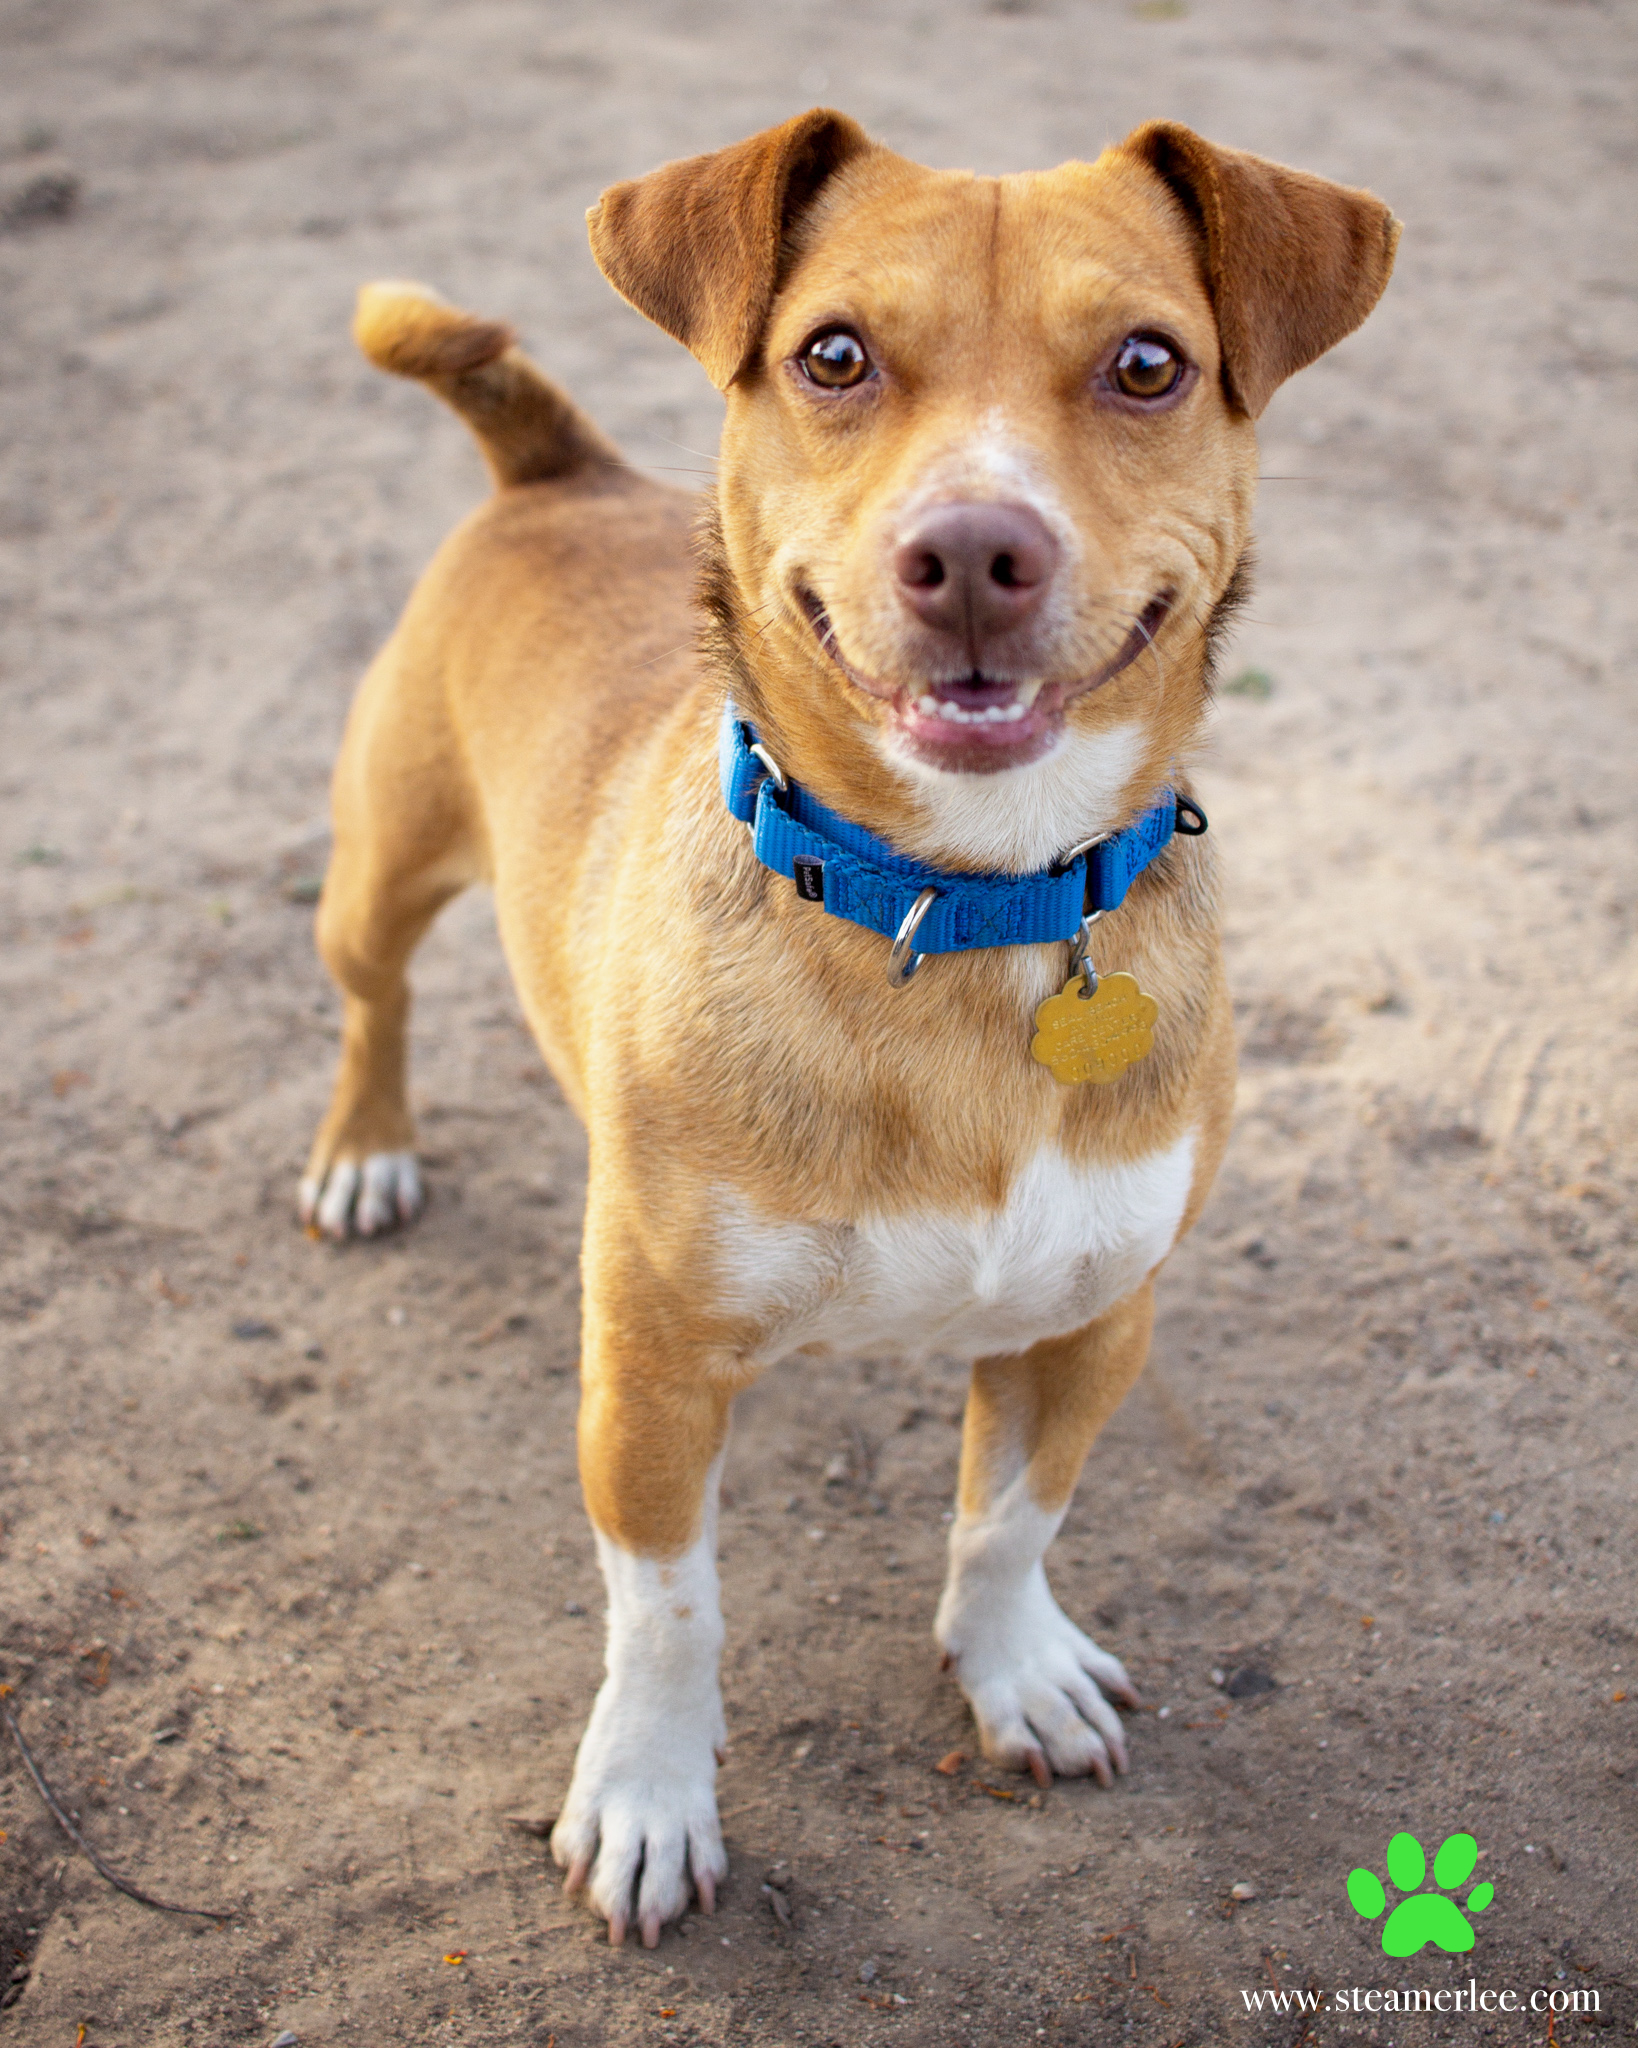 310-Orange-County-Dog-Photography-Steamer-Lee-Southern-California-SBACC.JPG